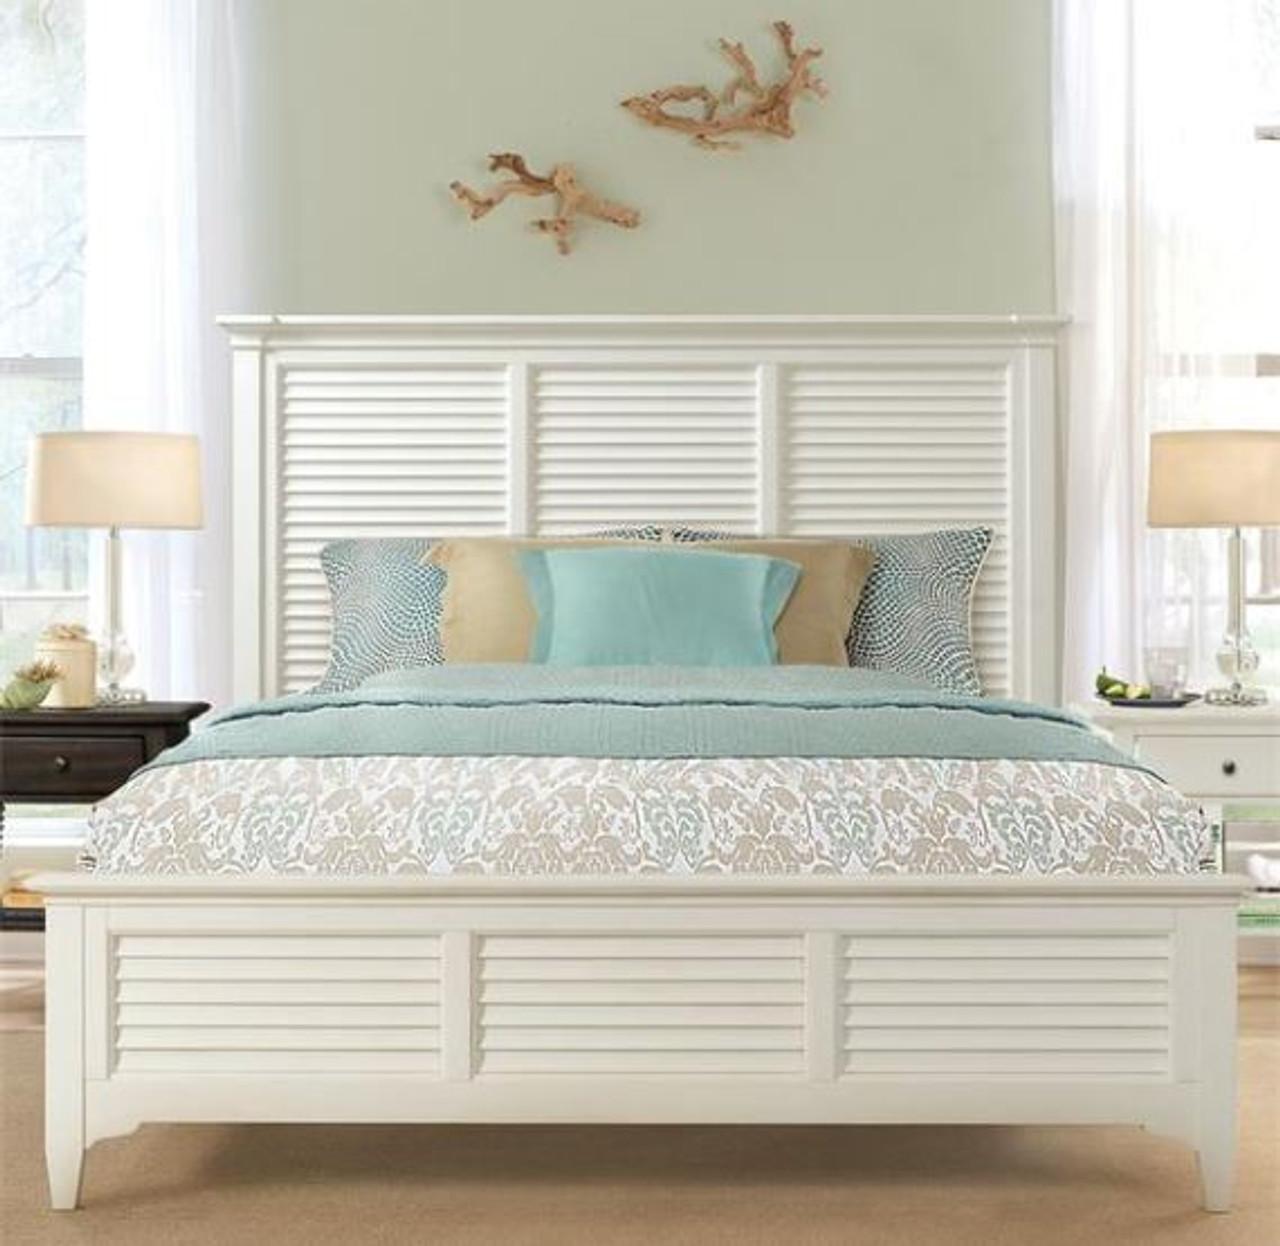 Superb Myra Louver Manteo Furniture Appliance Download Free Architecture Designs Grimeyleaguecom